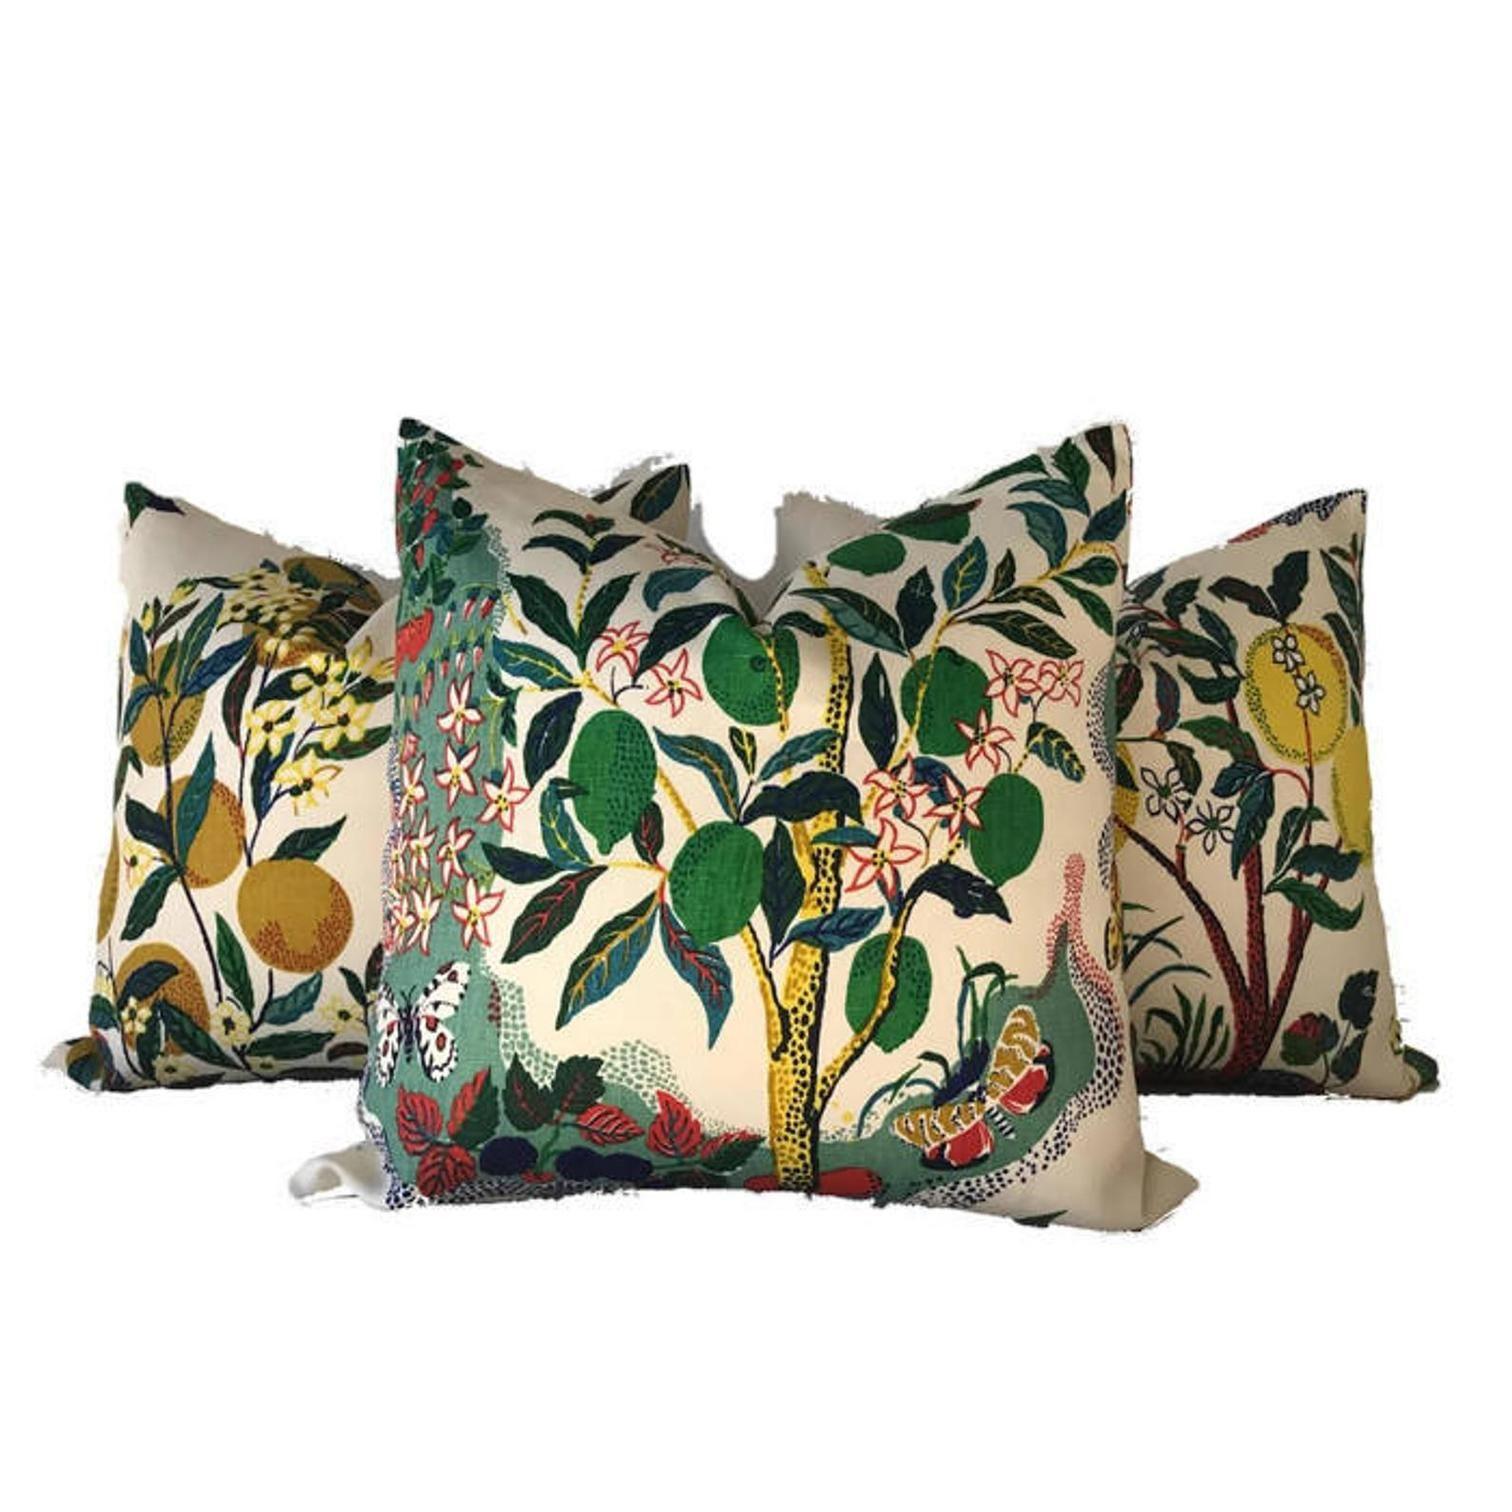 Schumacher Citrus Garden Pillow Cover Garden Pillows Decorative Throw Pillow Covers Pillows